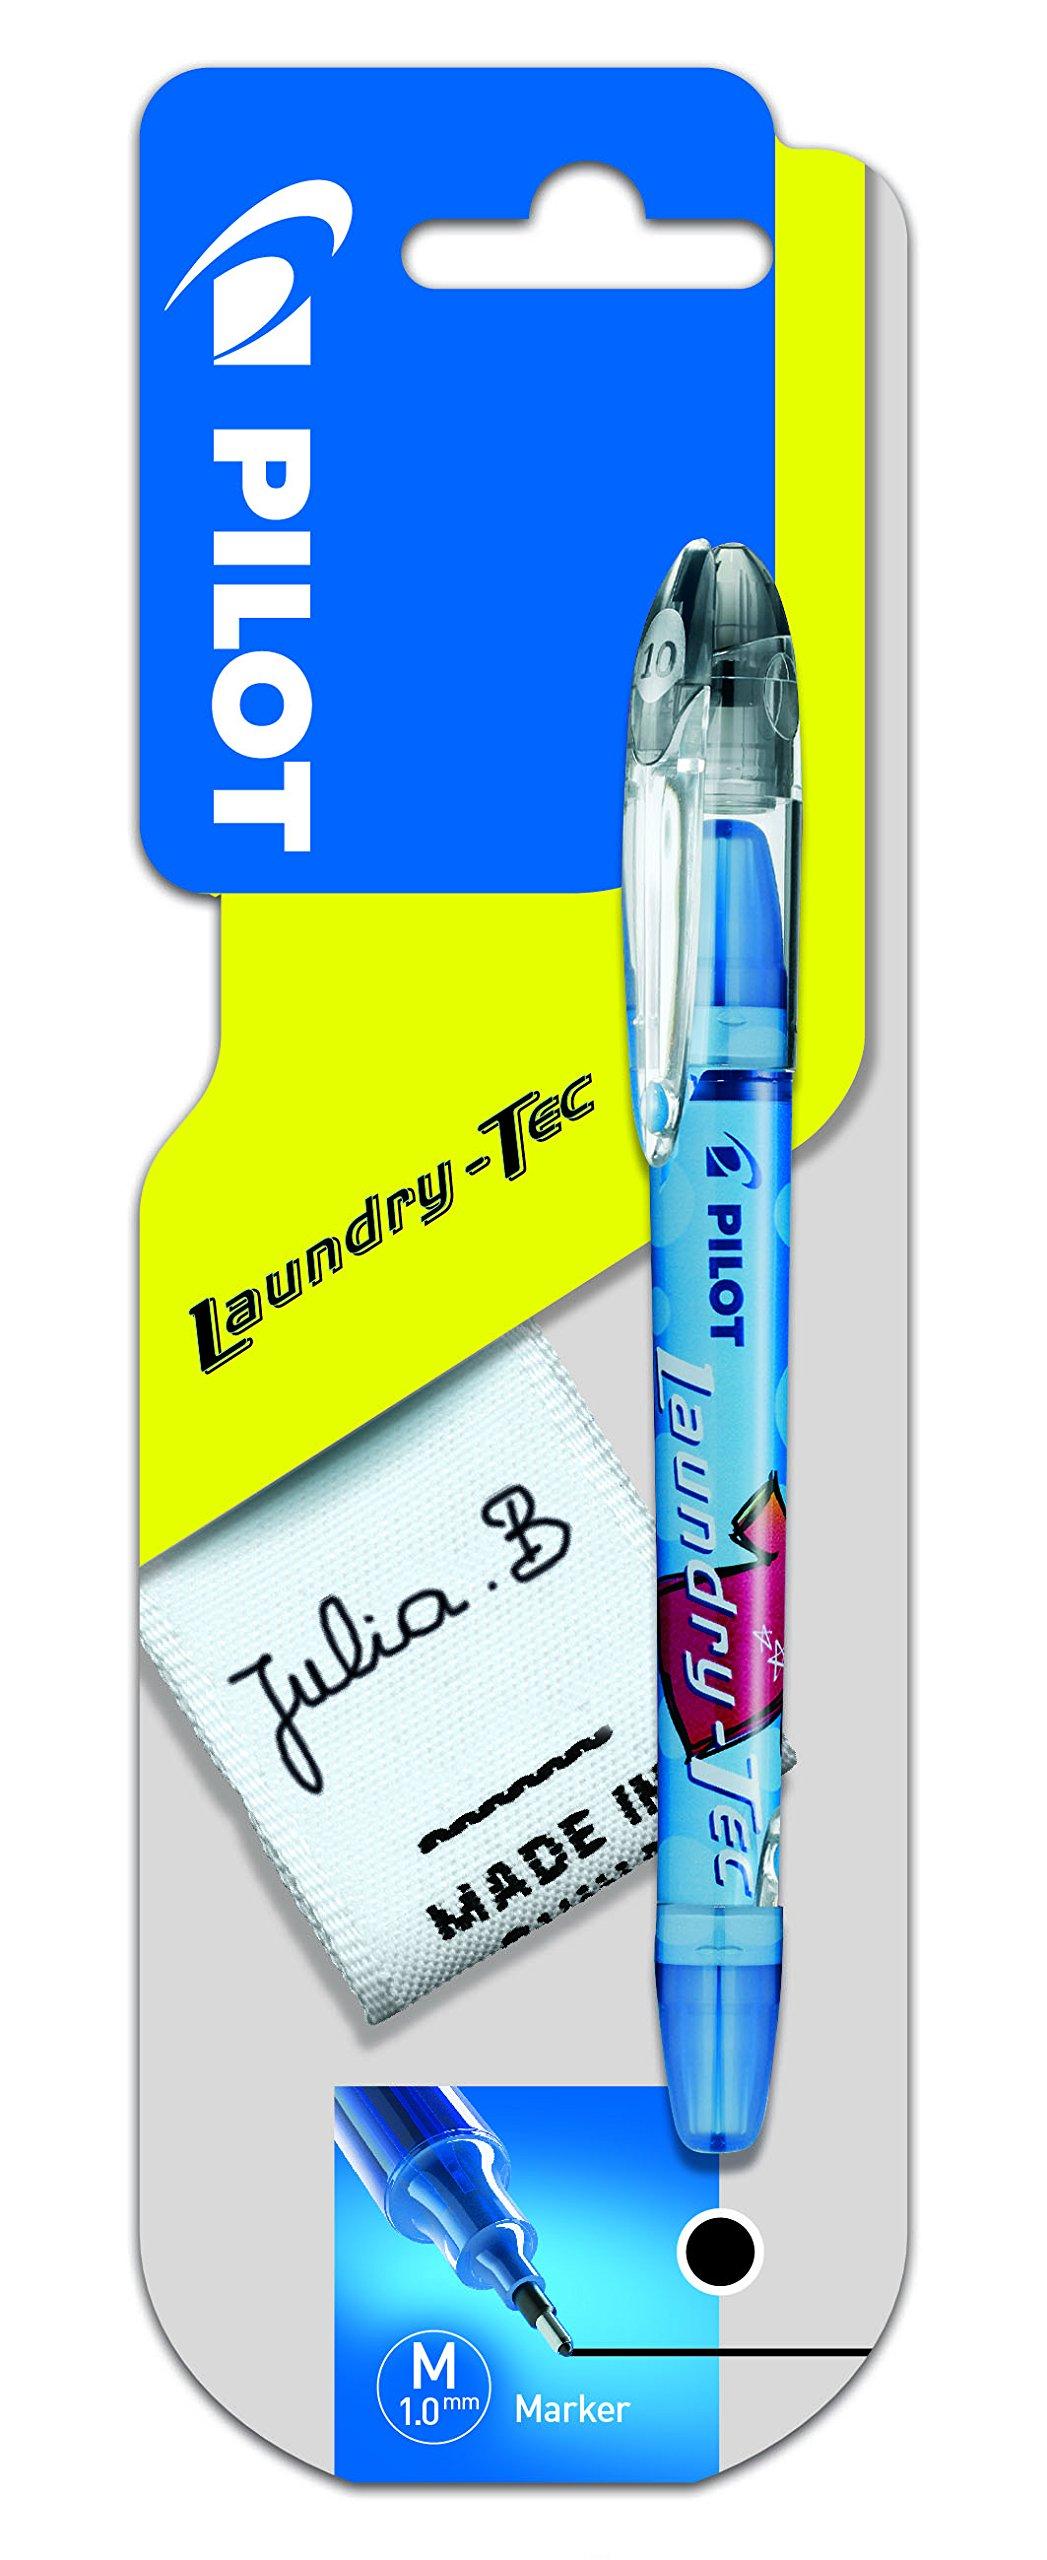 Pilot Laundry Tec Fabric Marker 1.0 mm Tip - Black, [0FA2FQSY]